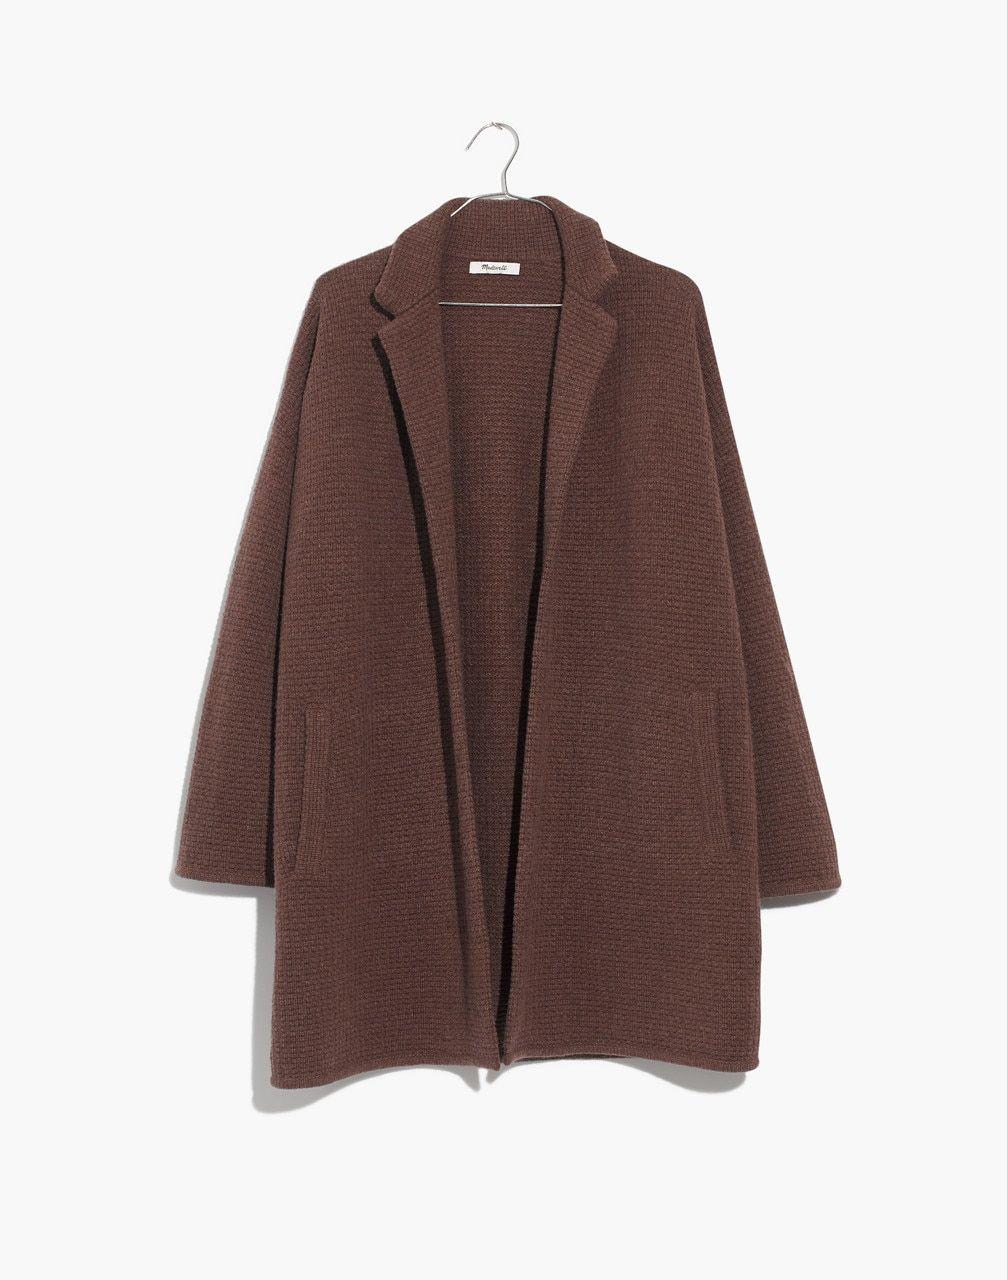 Chilton Sweater-Coat in heather cocoa image 4  aad6940fe